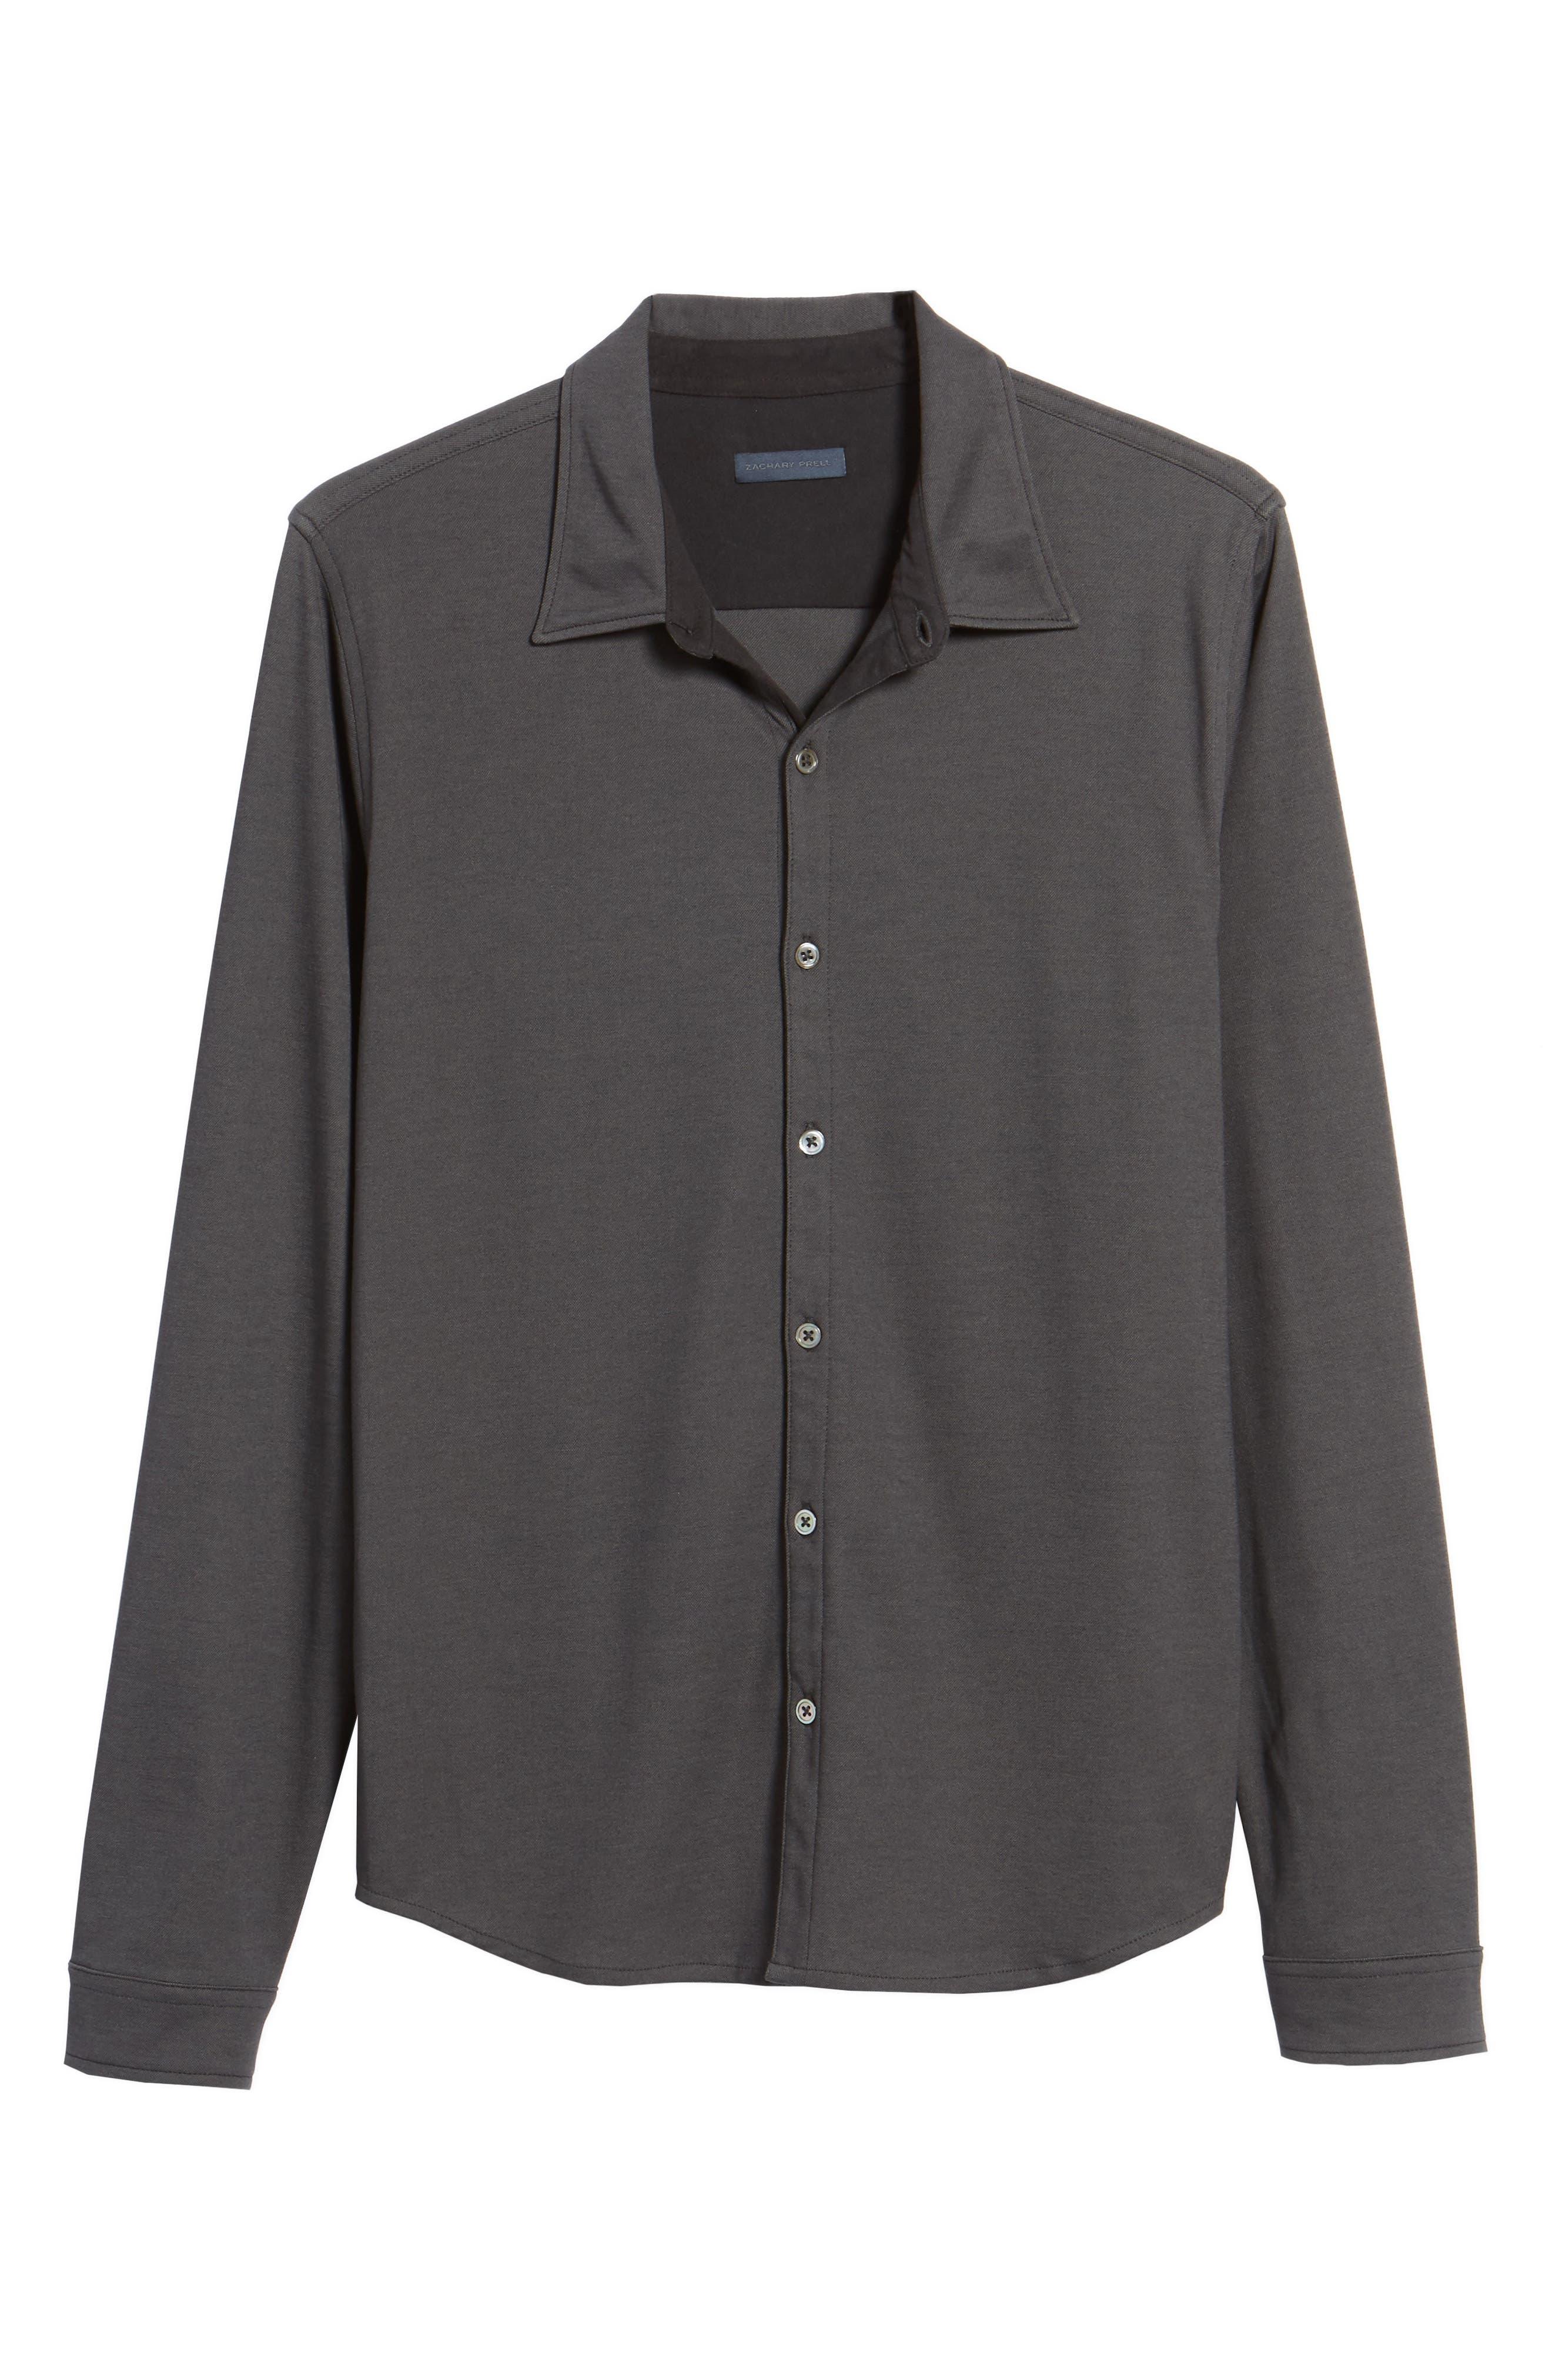 Glacier Knit Sport Shirt,                             Alternate thumbnail 6, color,                             Black